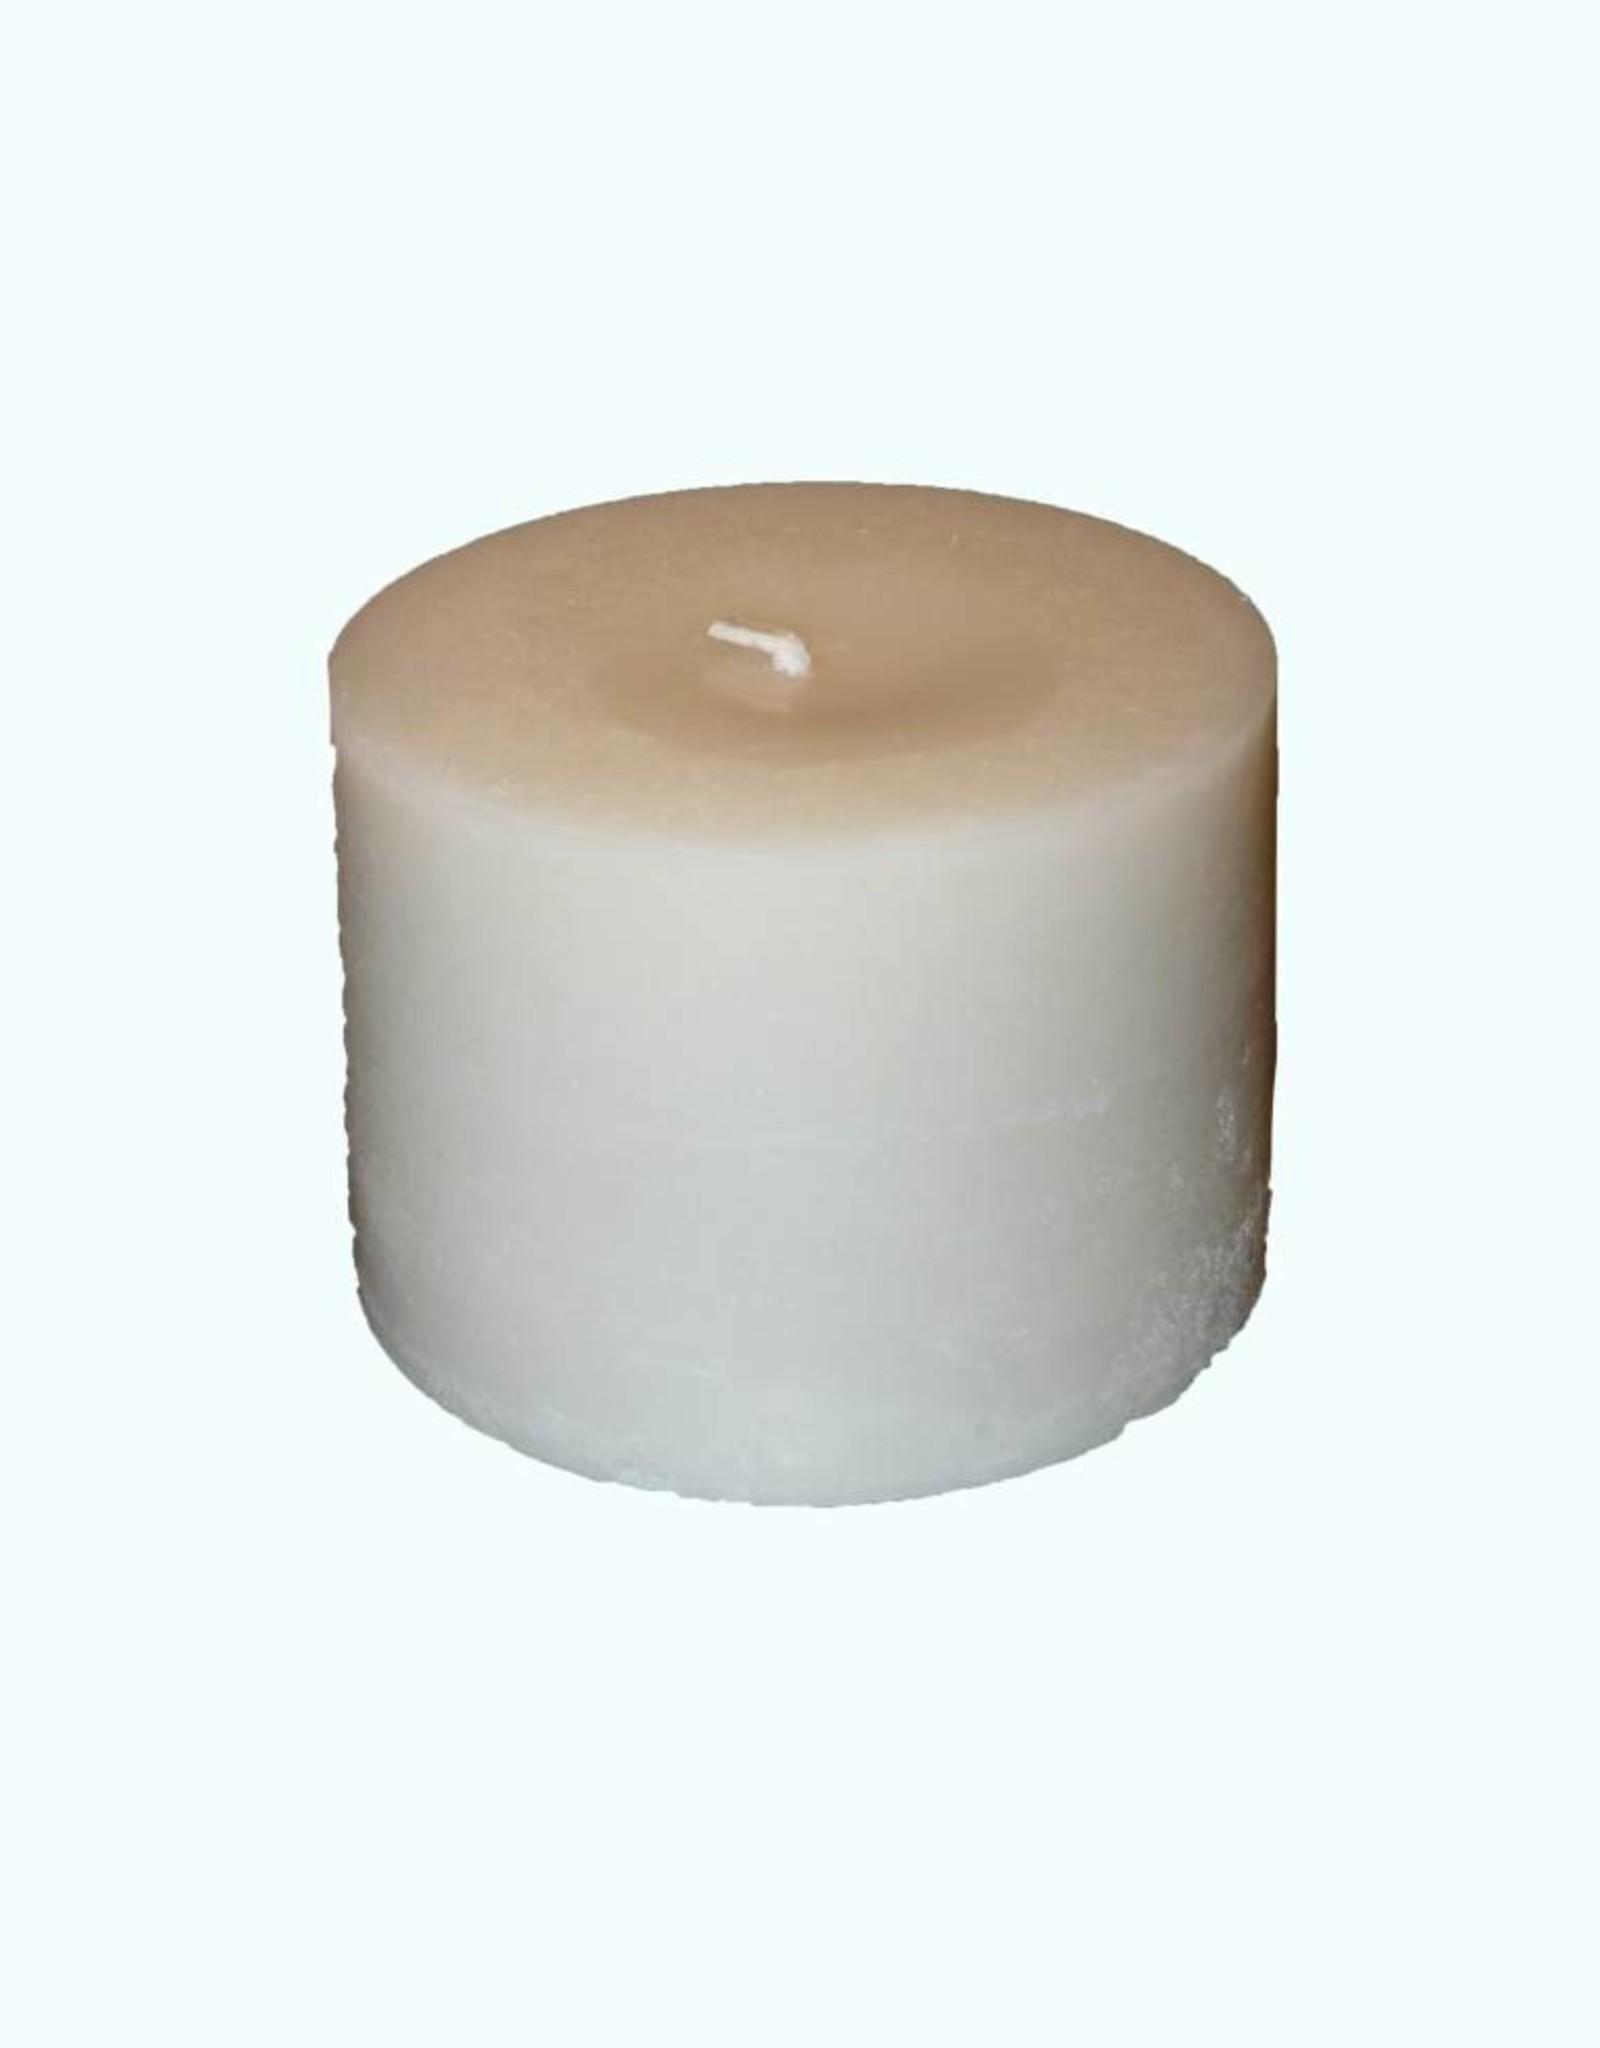 Grote Tuinkaars Wit XL Ø 18x12cm